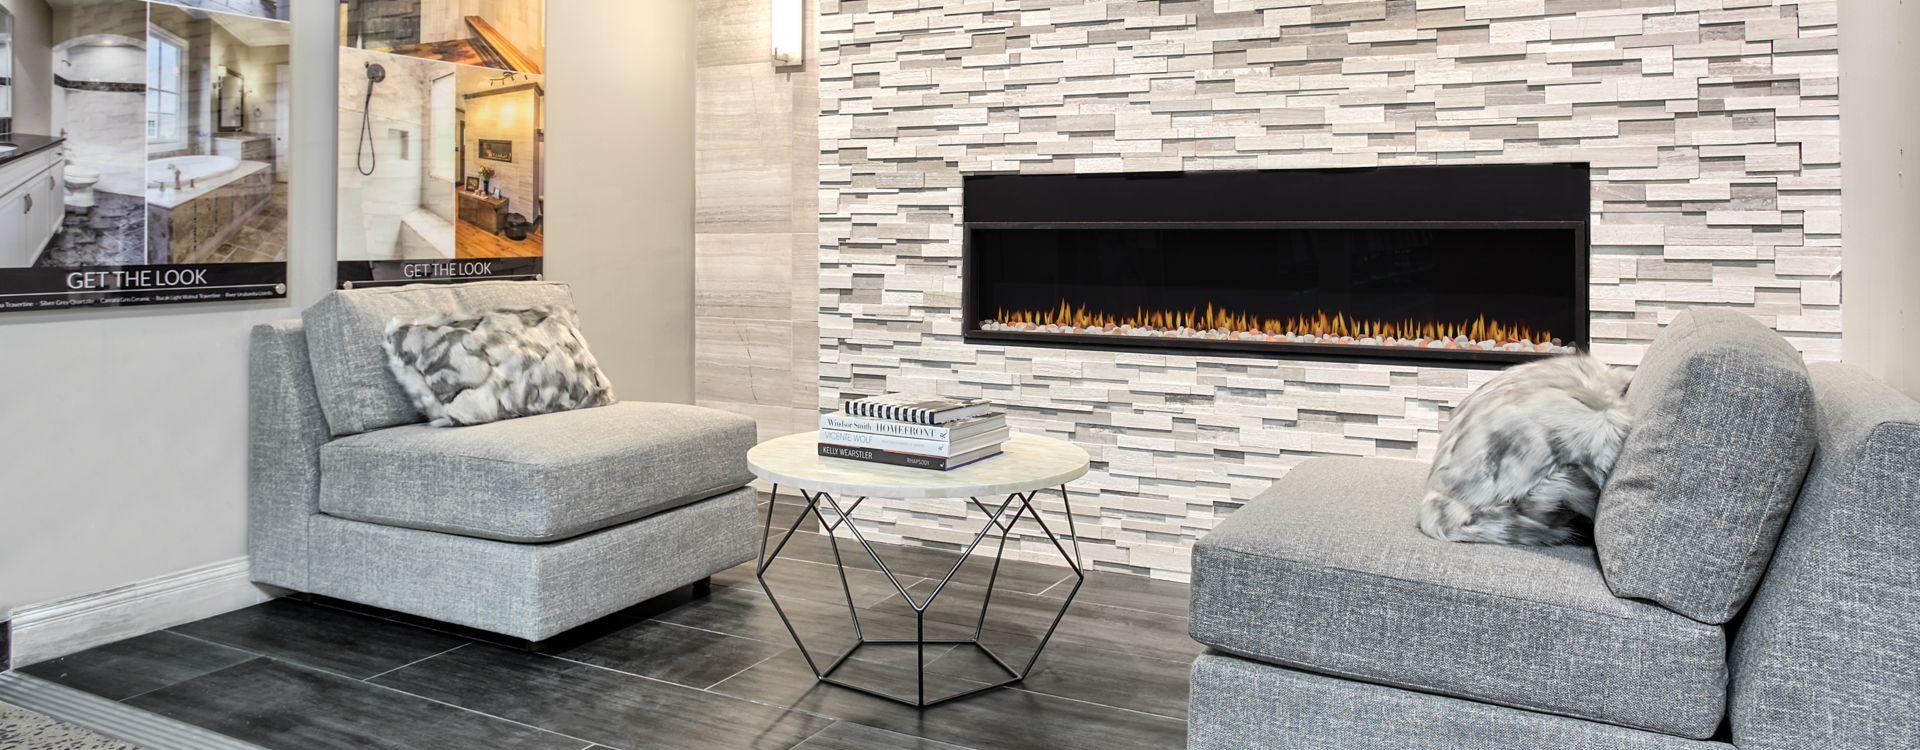 Living Room Tile Designs Trends Ideas For 2019 The Tile Shop